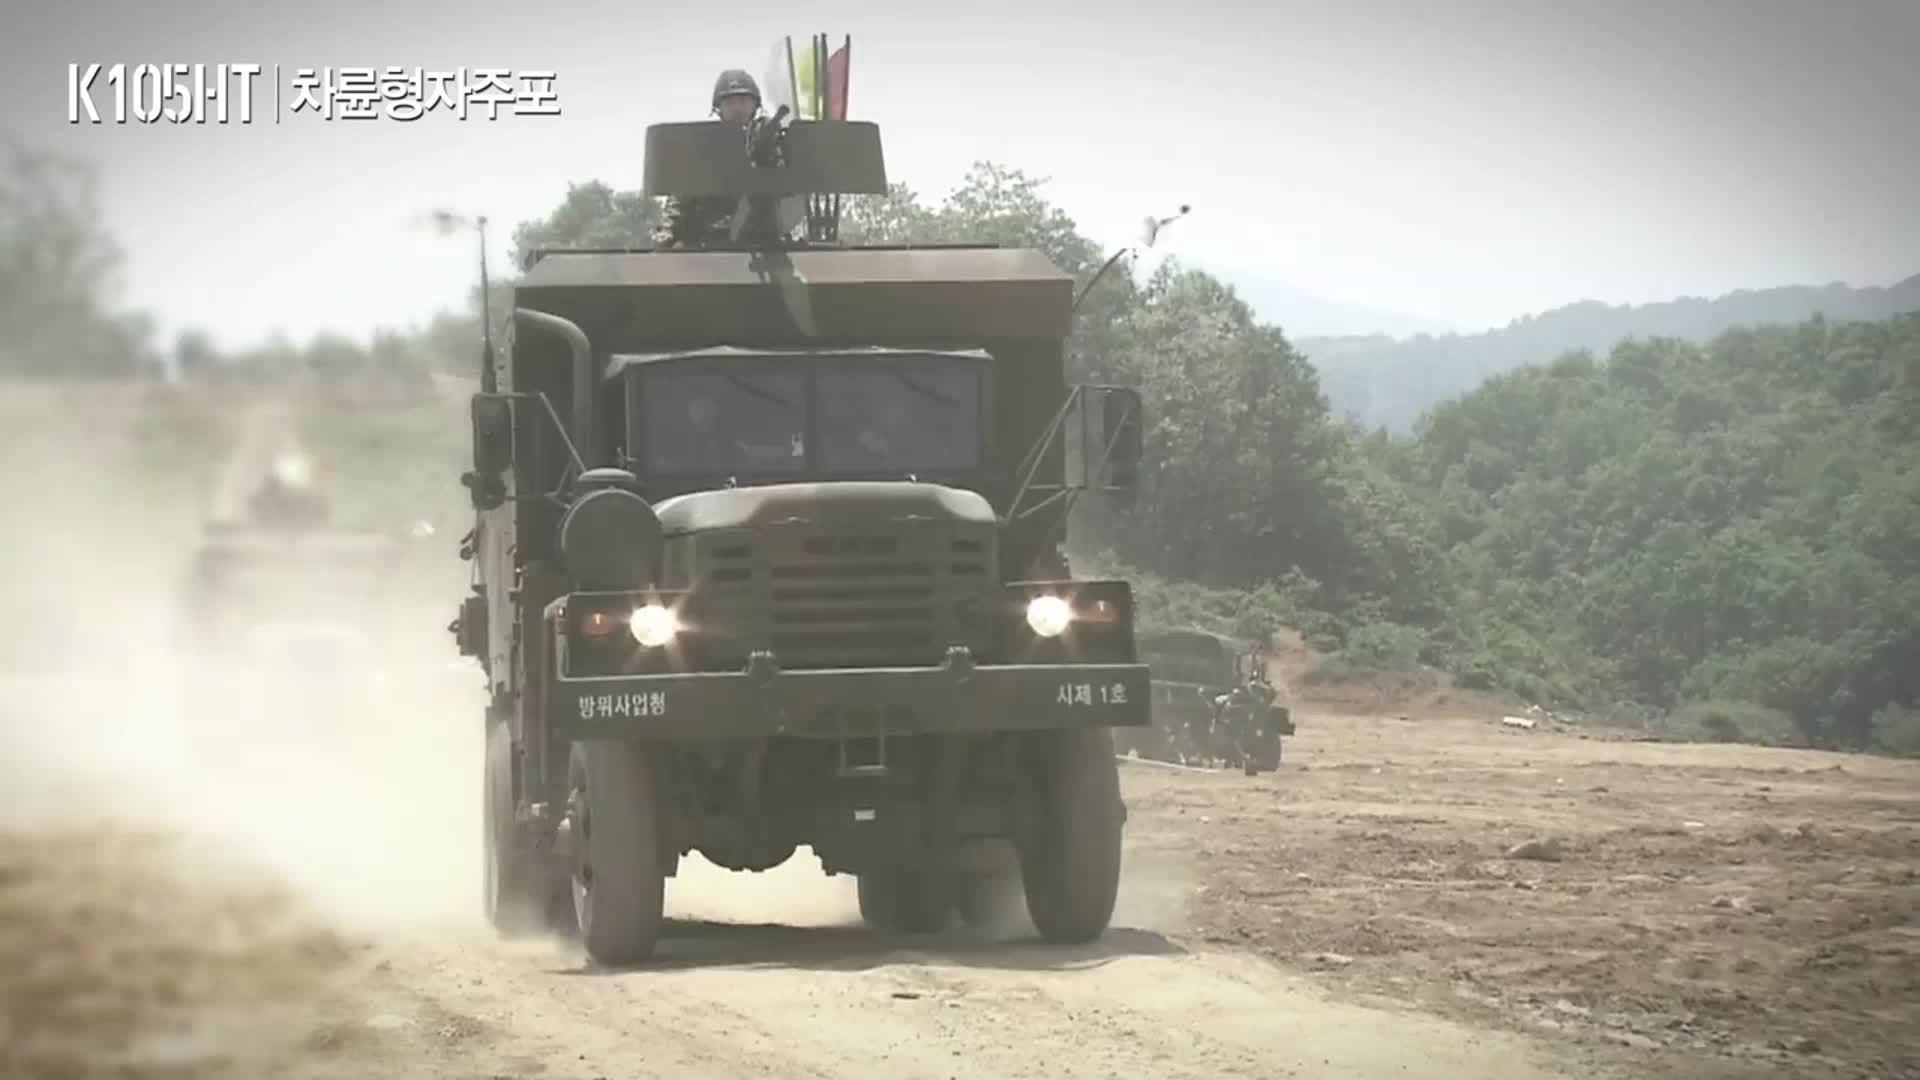 korea, military, militarygfys, south korea, K105HT self-propelled howitzer GIFs